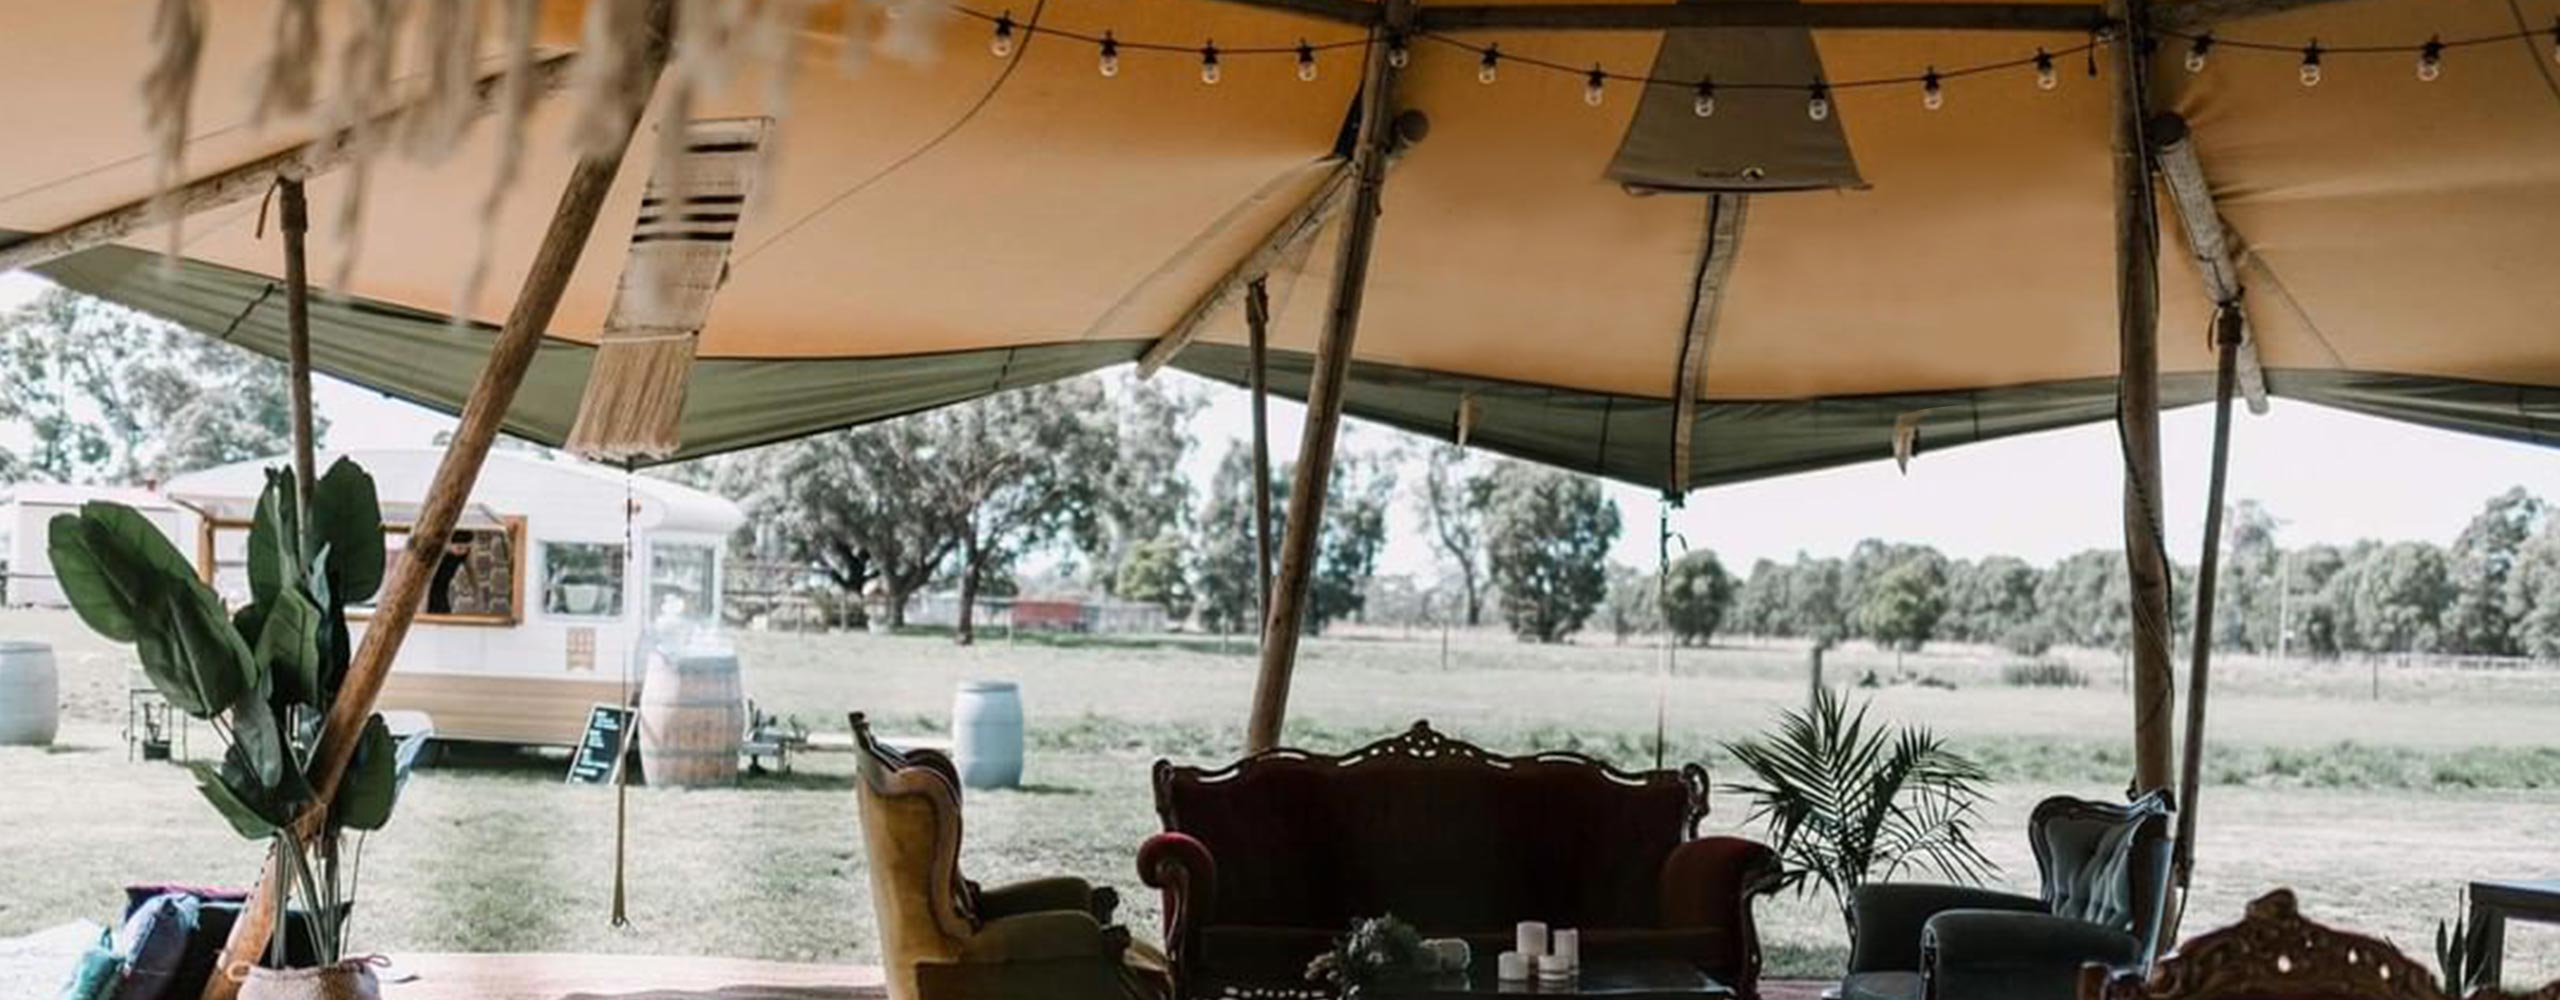 Boho style giant tipi with caravan bar in Gippsland, Victoria